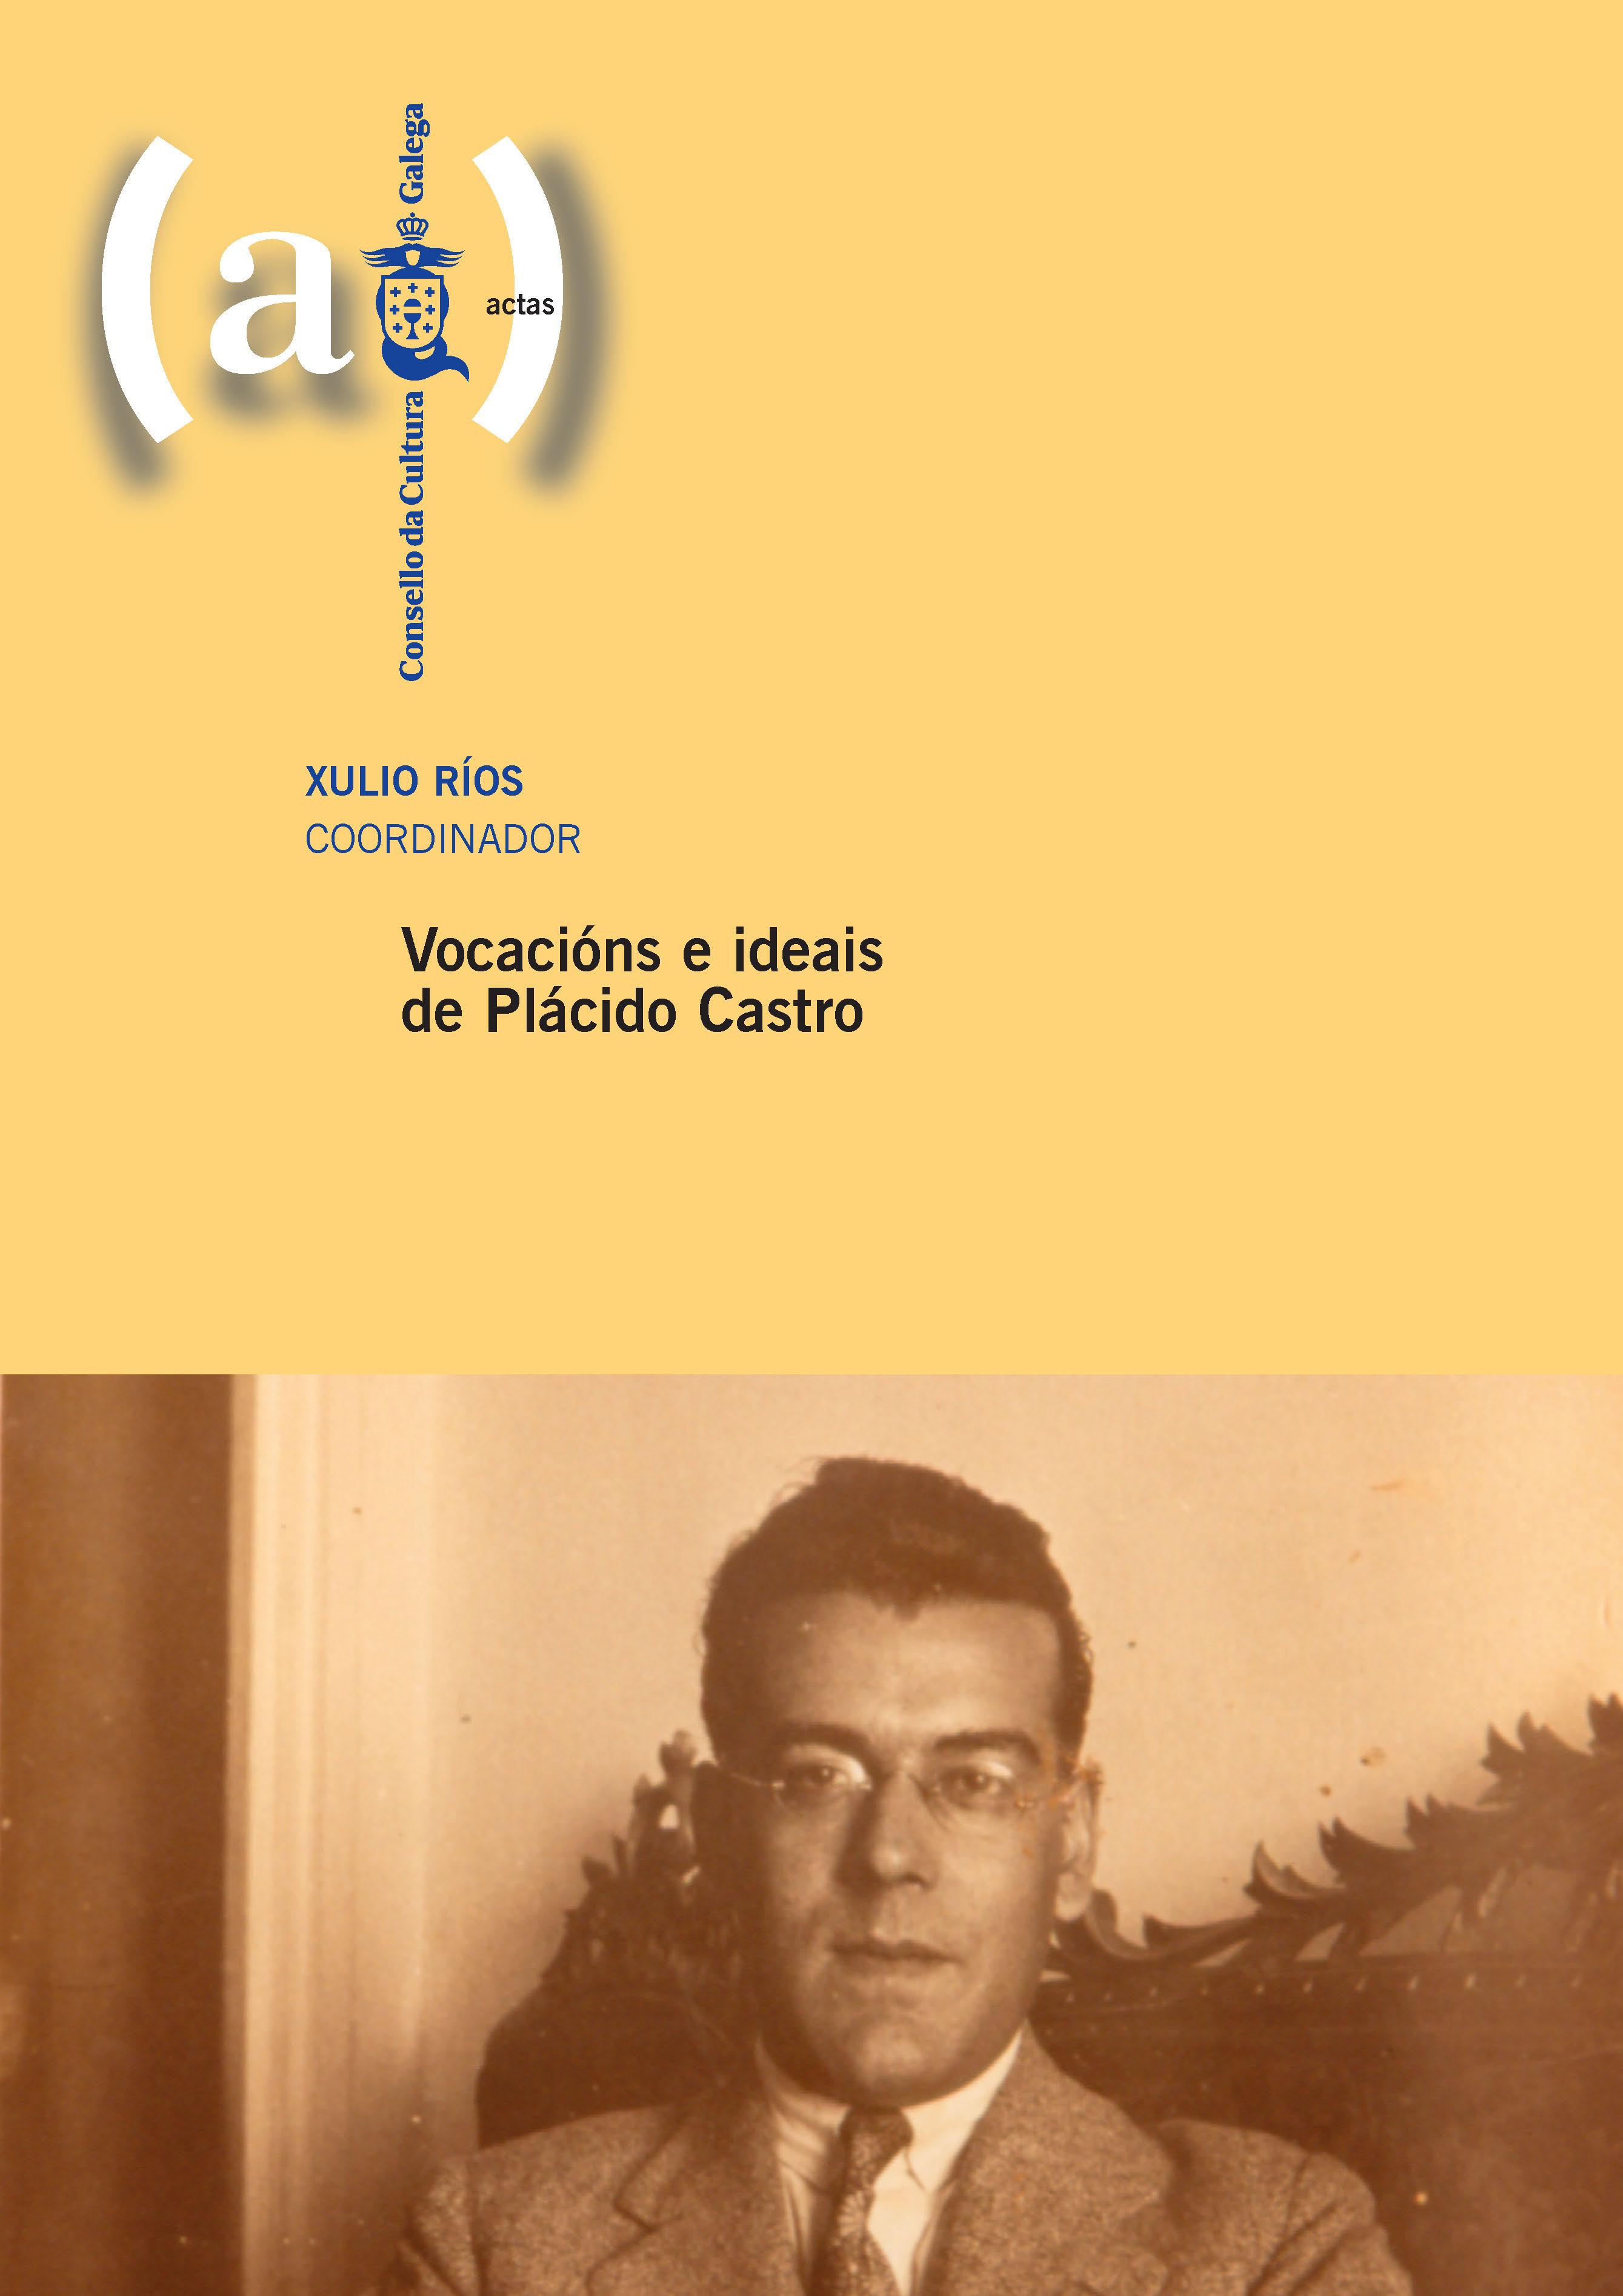 http://consellodacultura.gal/mediateca/extras/CCG_2020_Vocacions-e-ideais-de-Placido-Castro.jpg